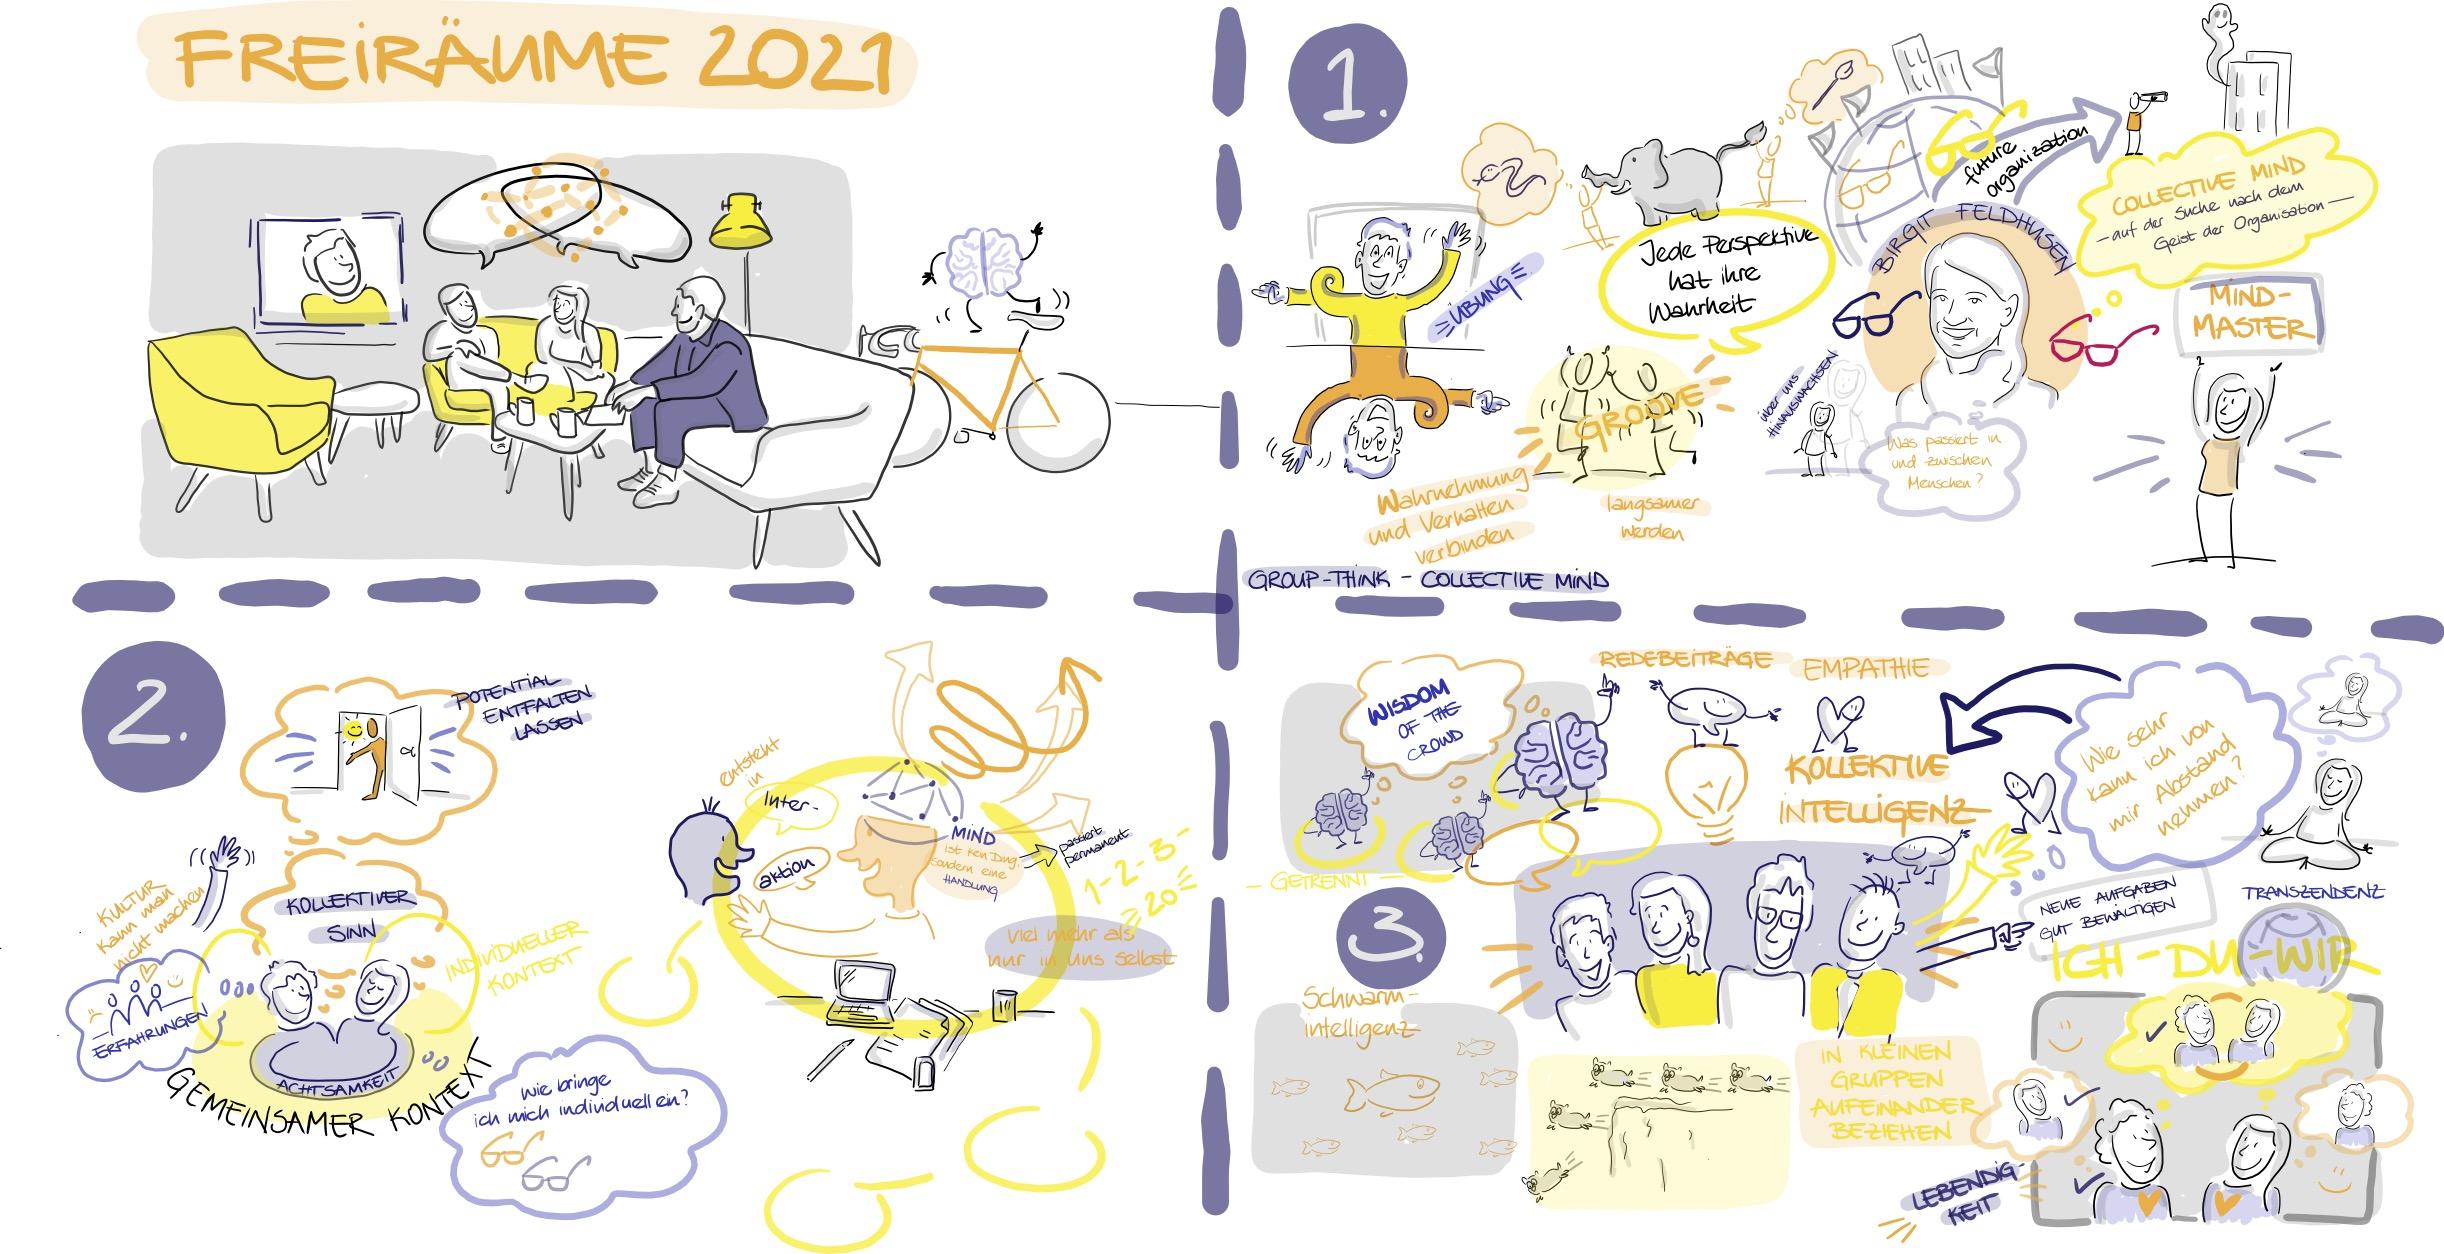 Graphic Recording - Collective Mind - Birgit Feldhusen - Freiräume 2021